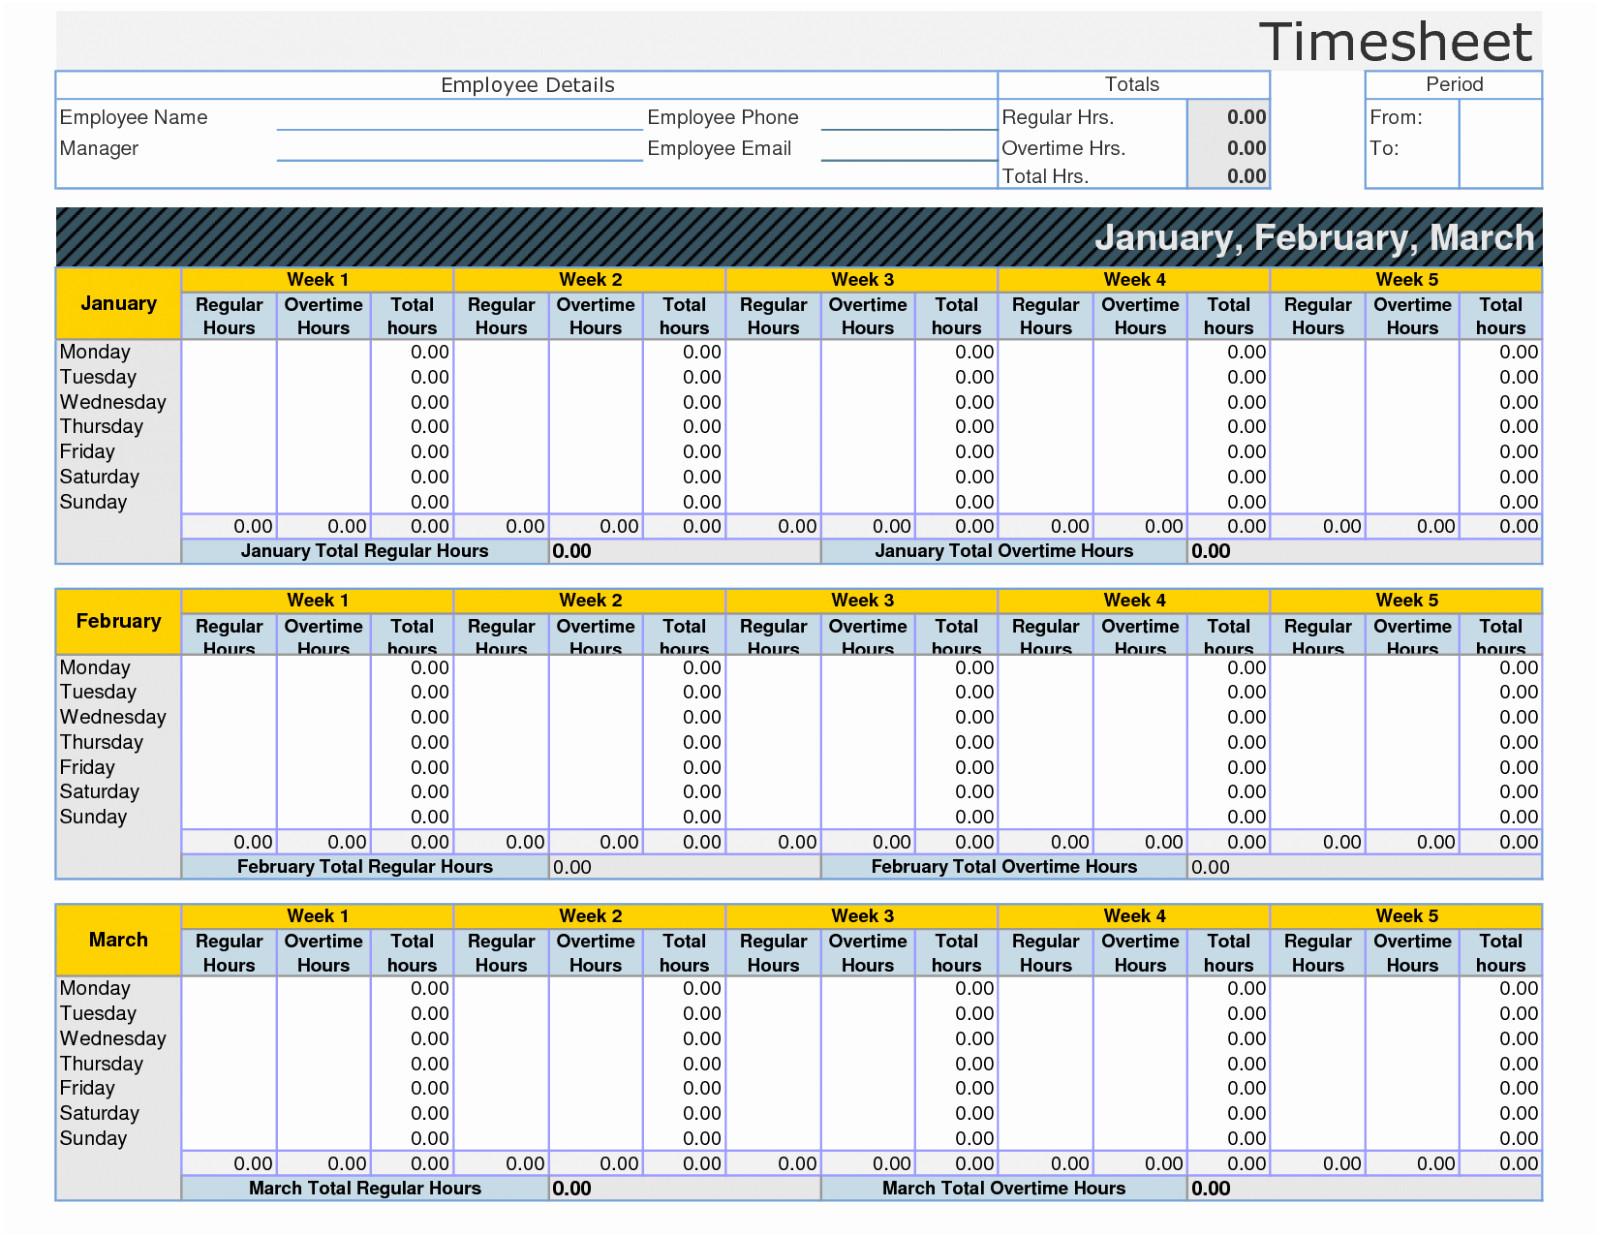 Employee Shift Scheduling Spreadsheet For Spreadsheet